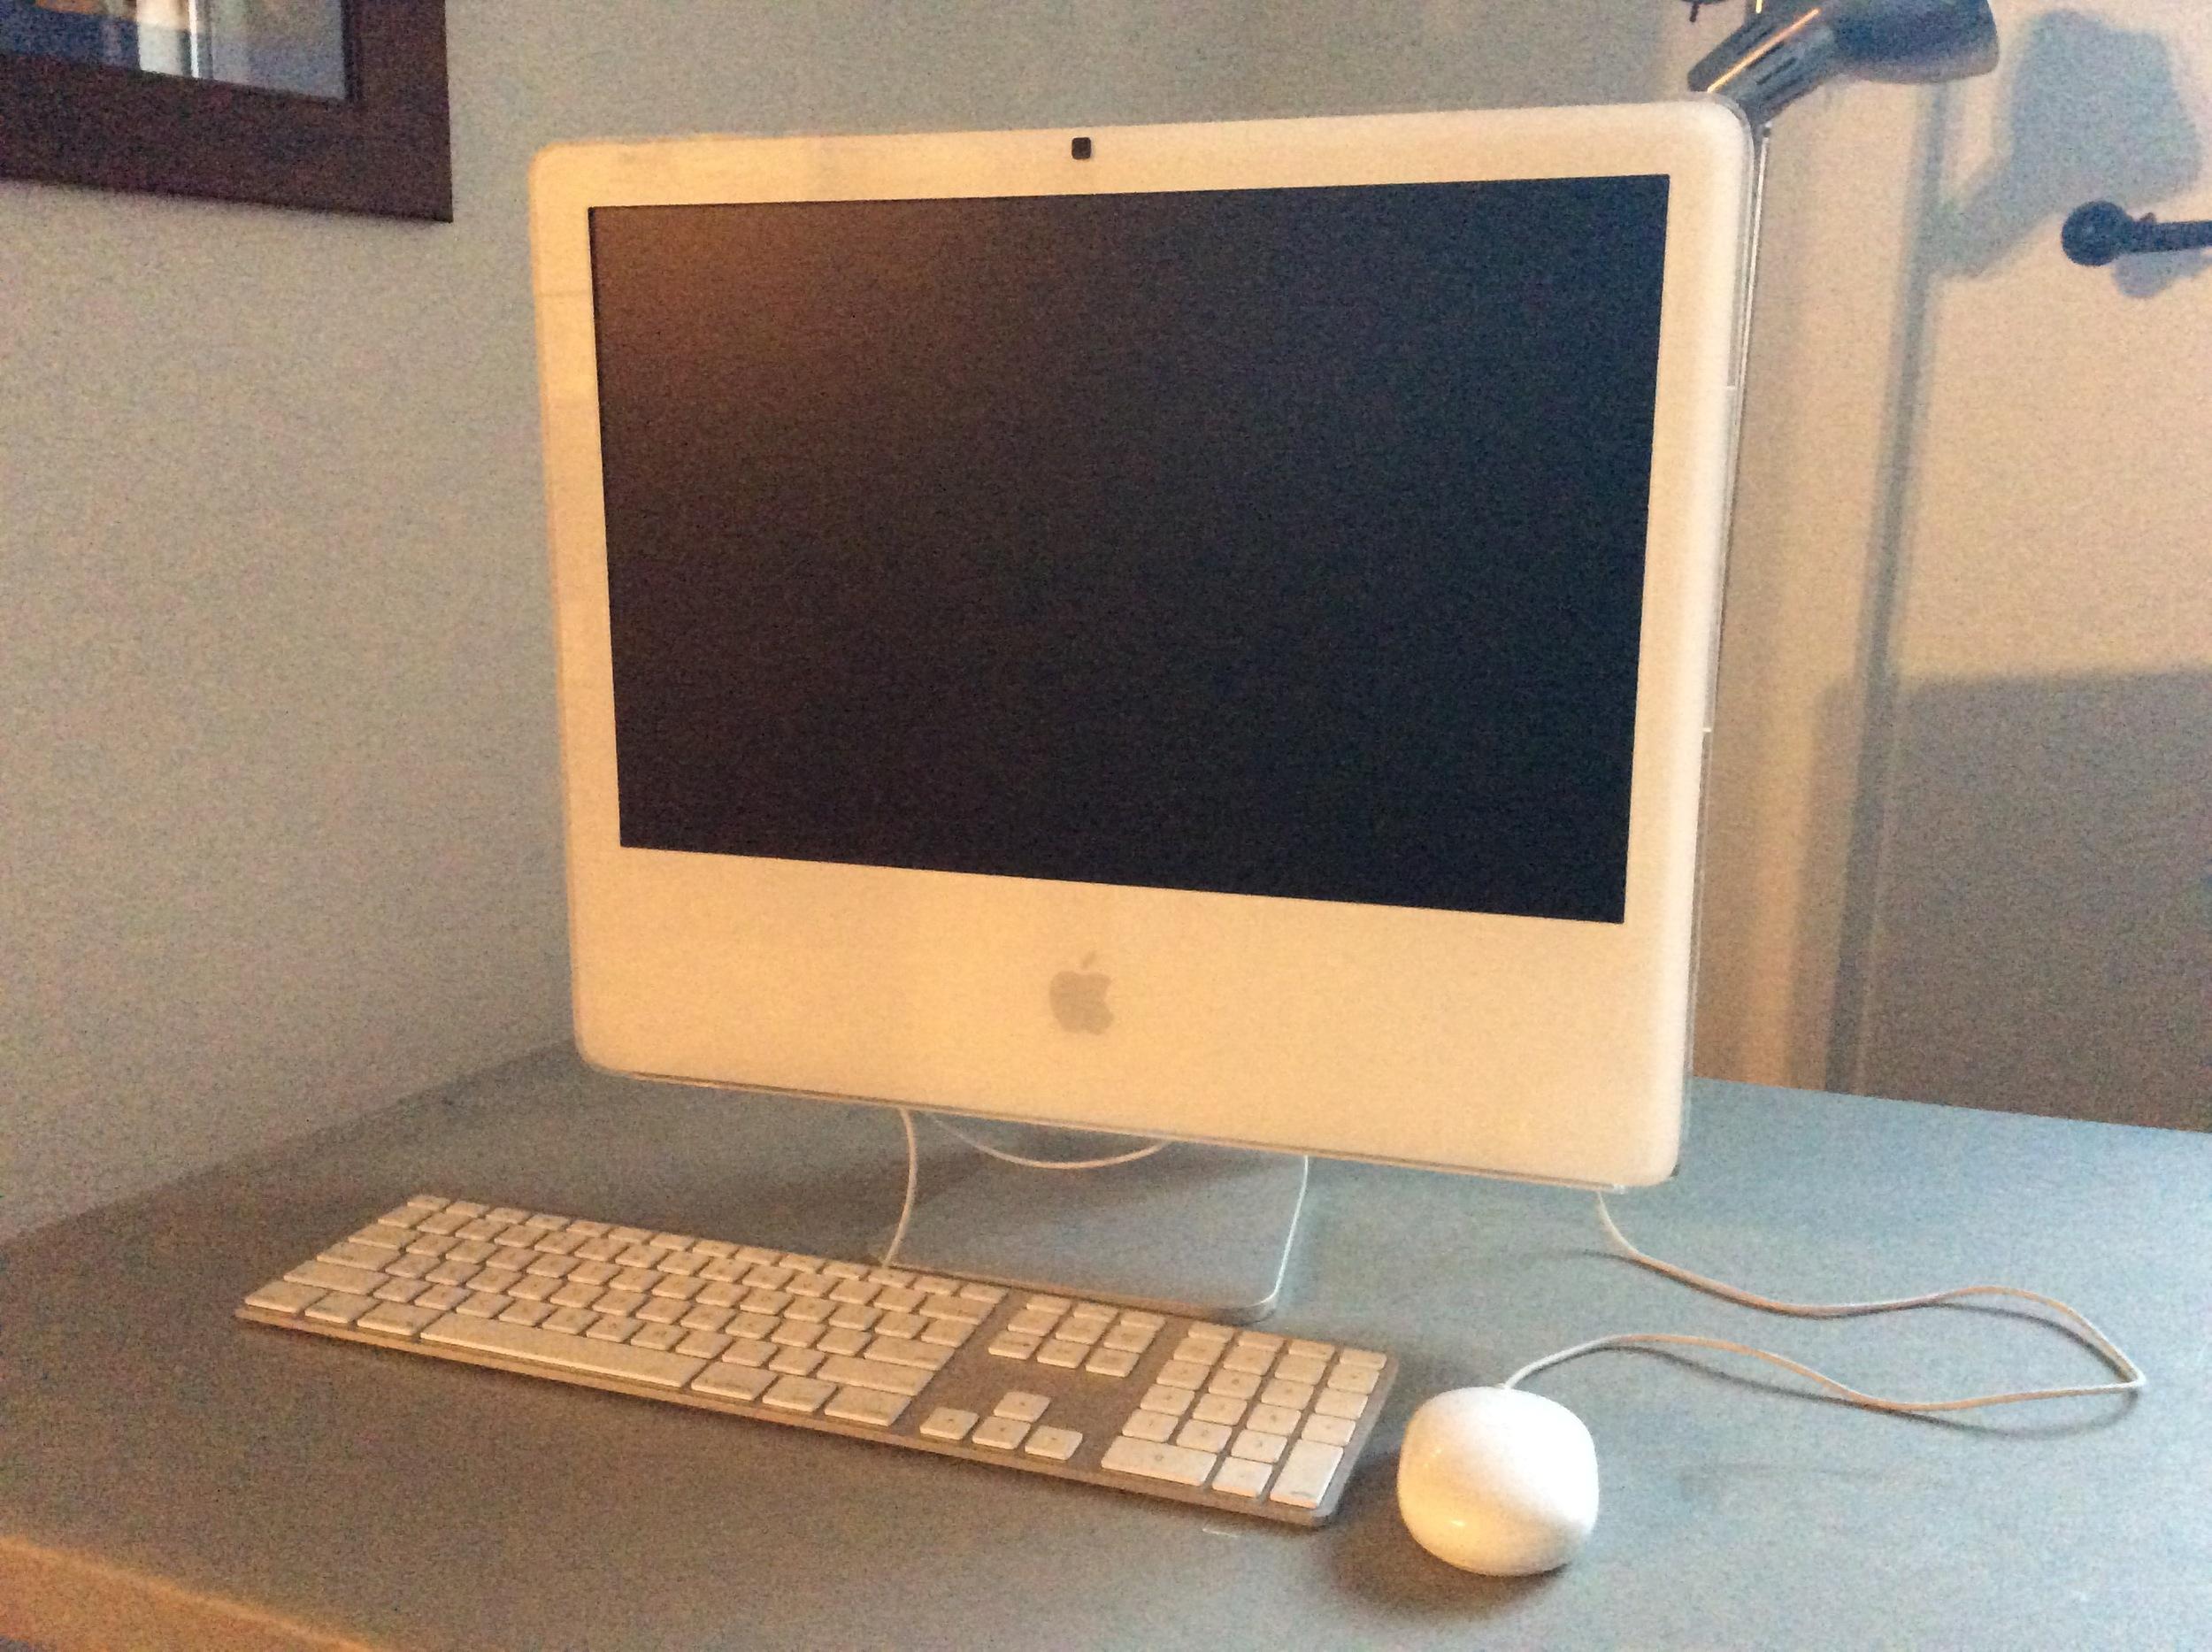 Repaired iMac